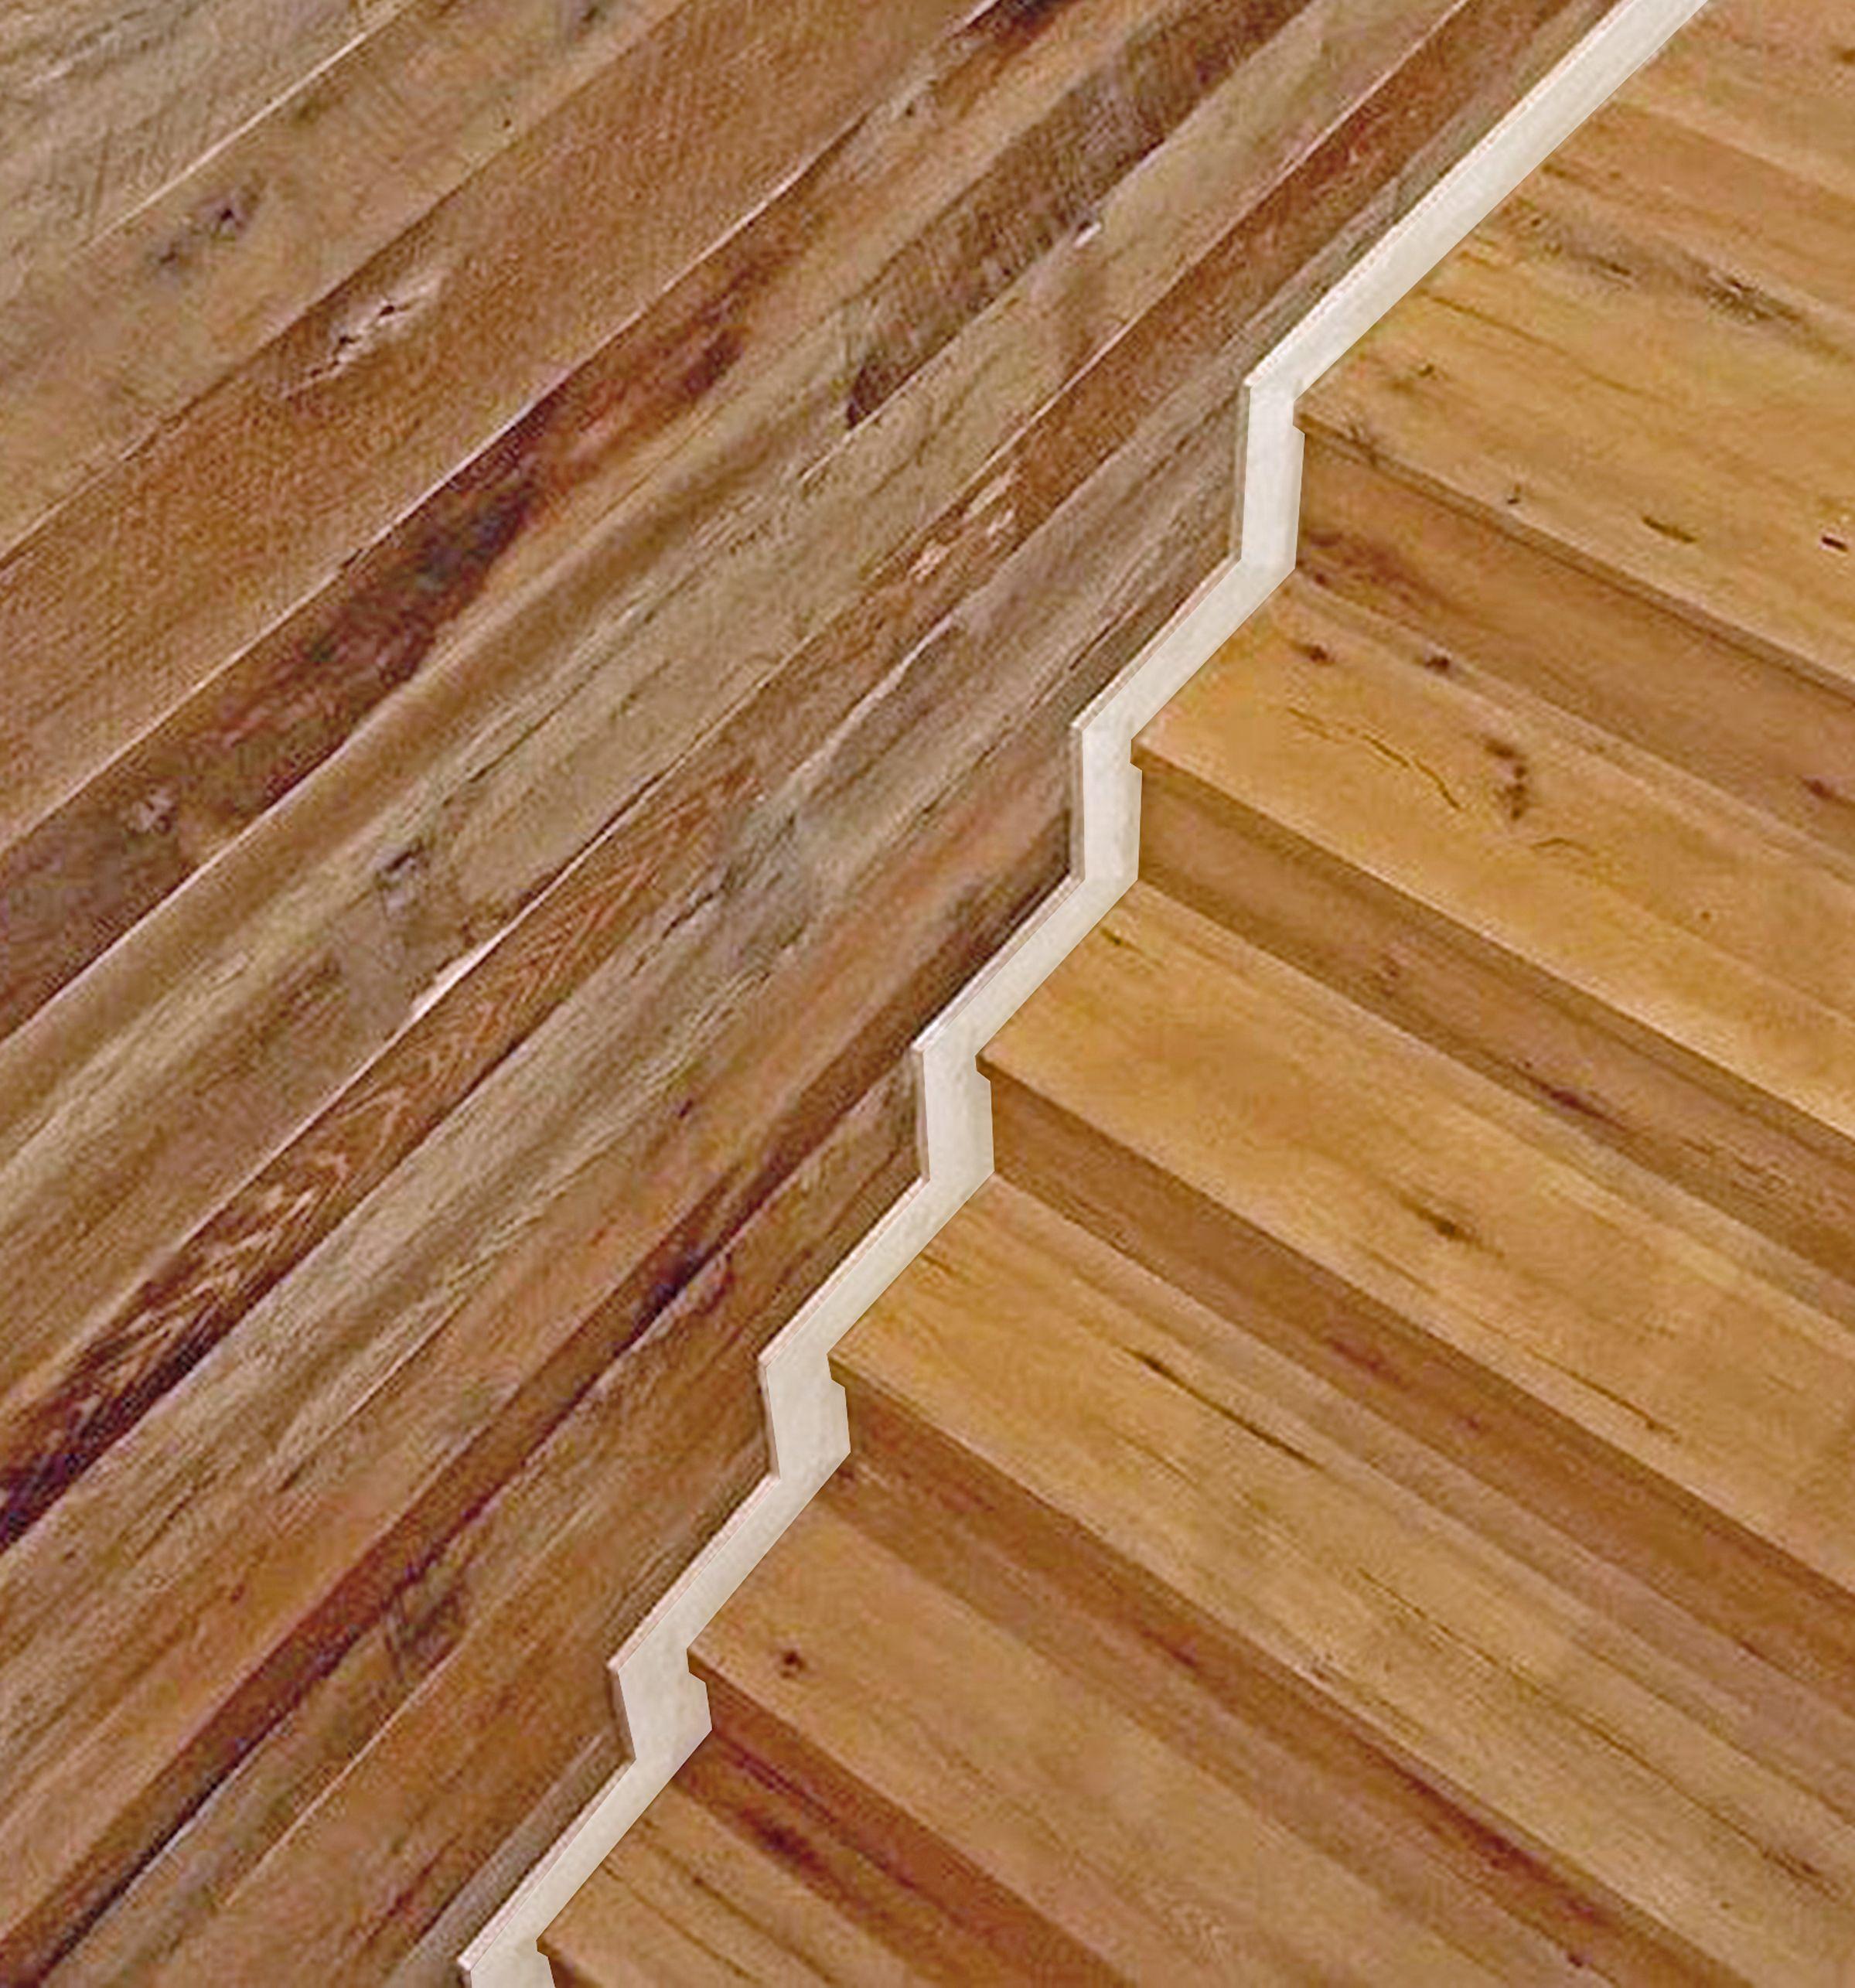 South End Condo_Stair Detail_Tektoniks Architects.jpg